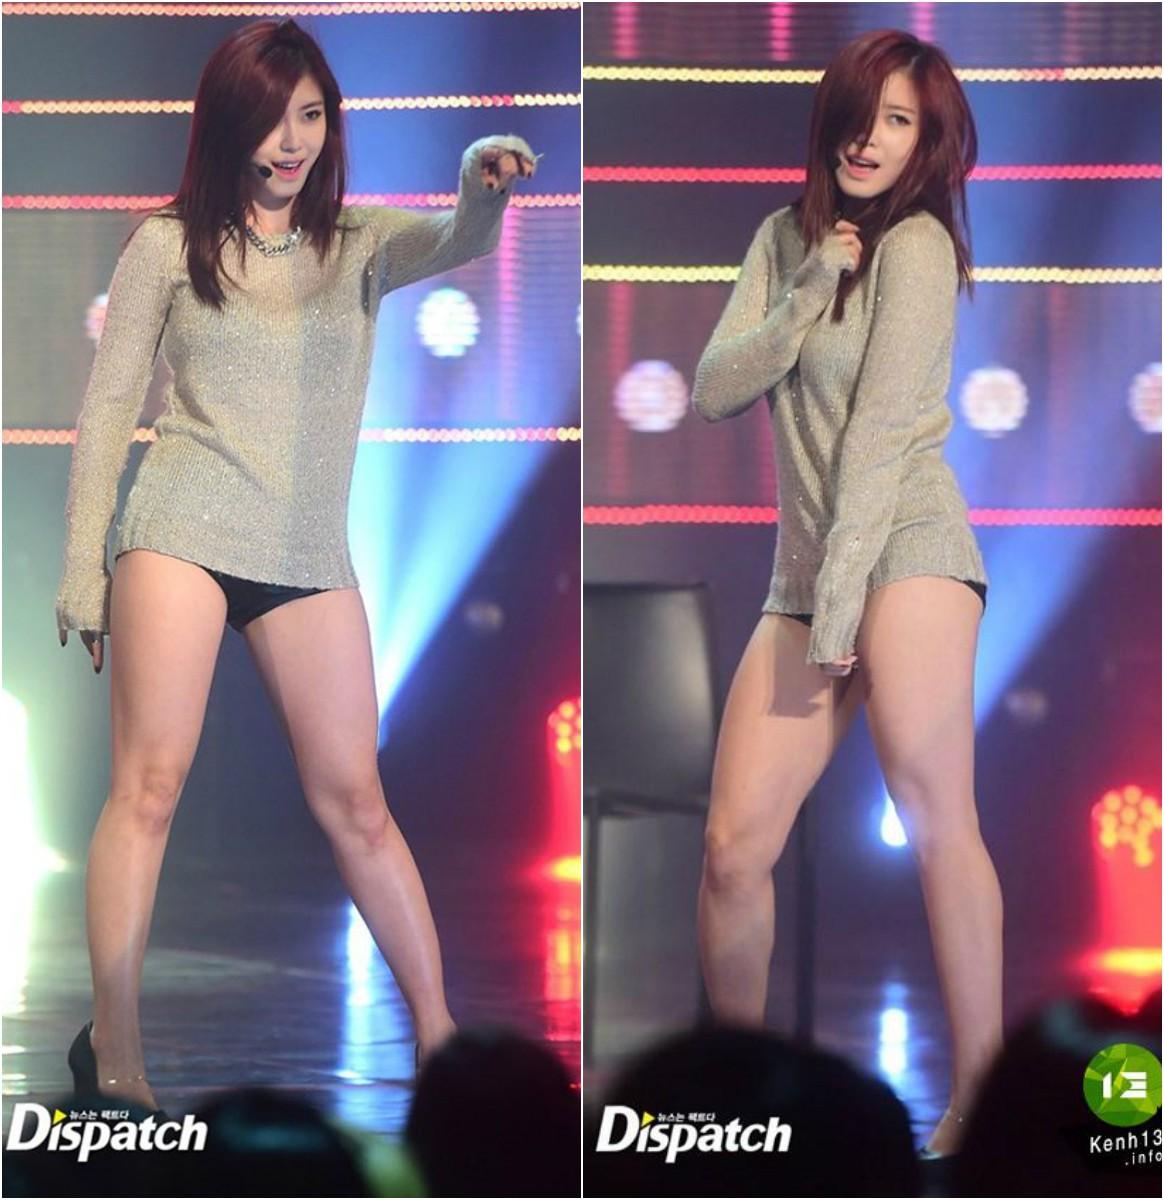 hyosung-3-15230987025791831440201.jpg